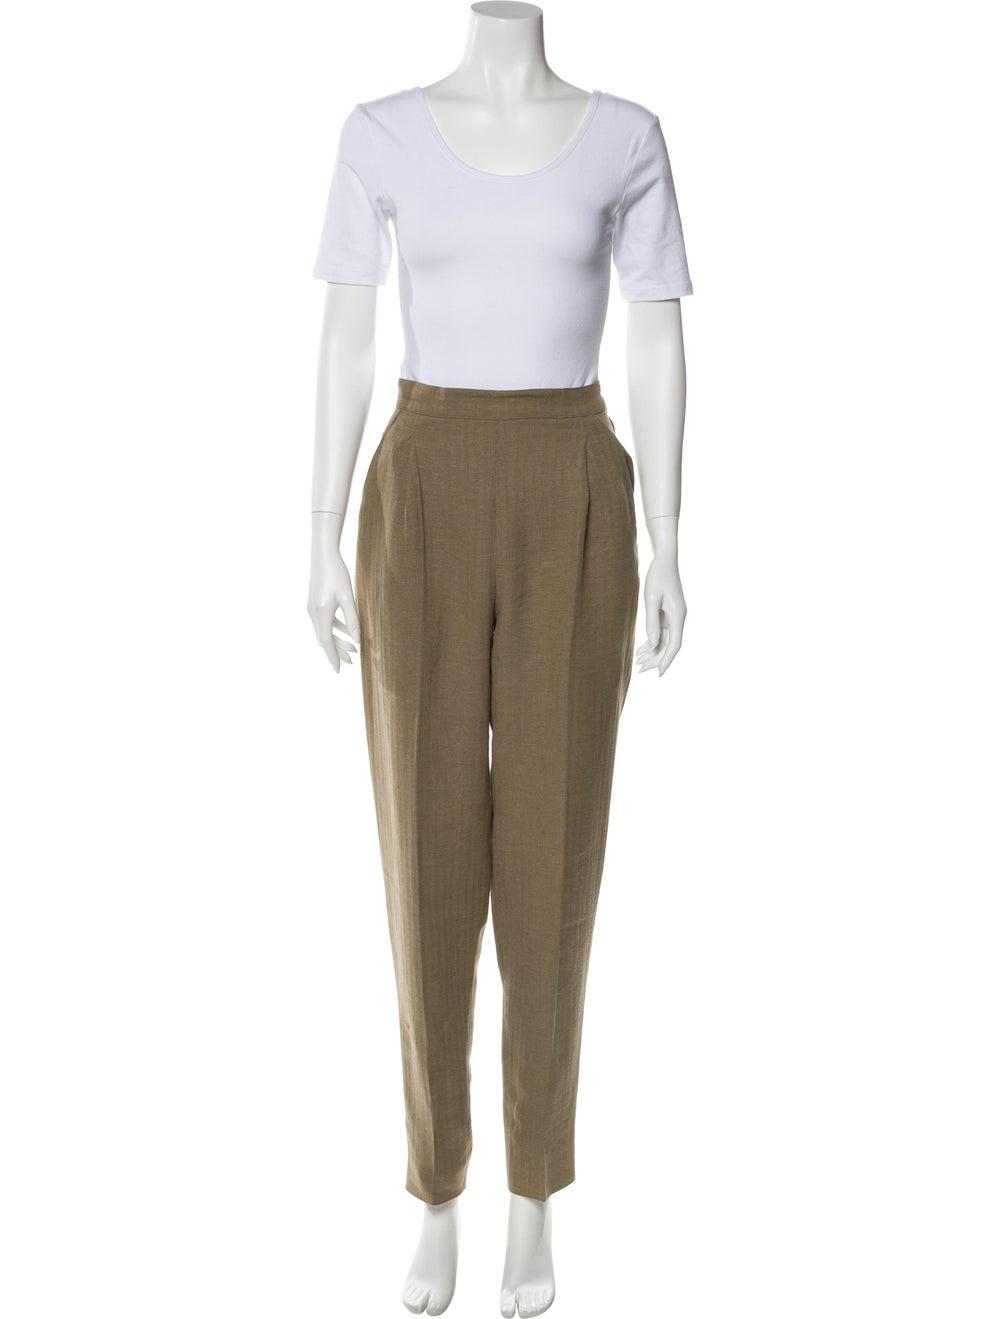 Max Mara Linen Tweed Pattern Pant Set Brown - image 4